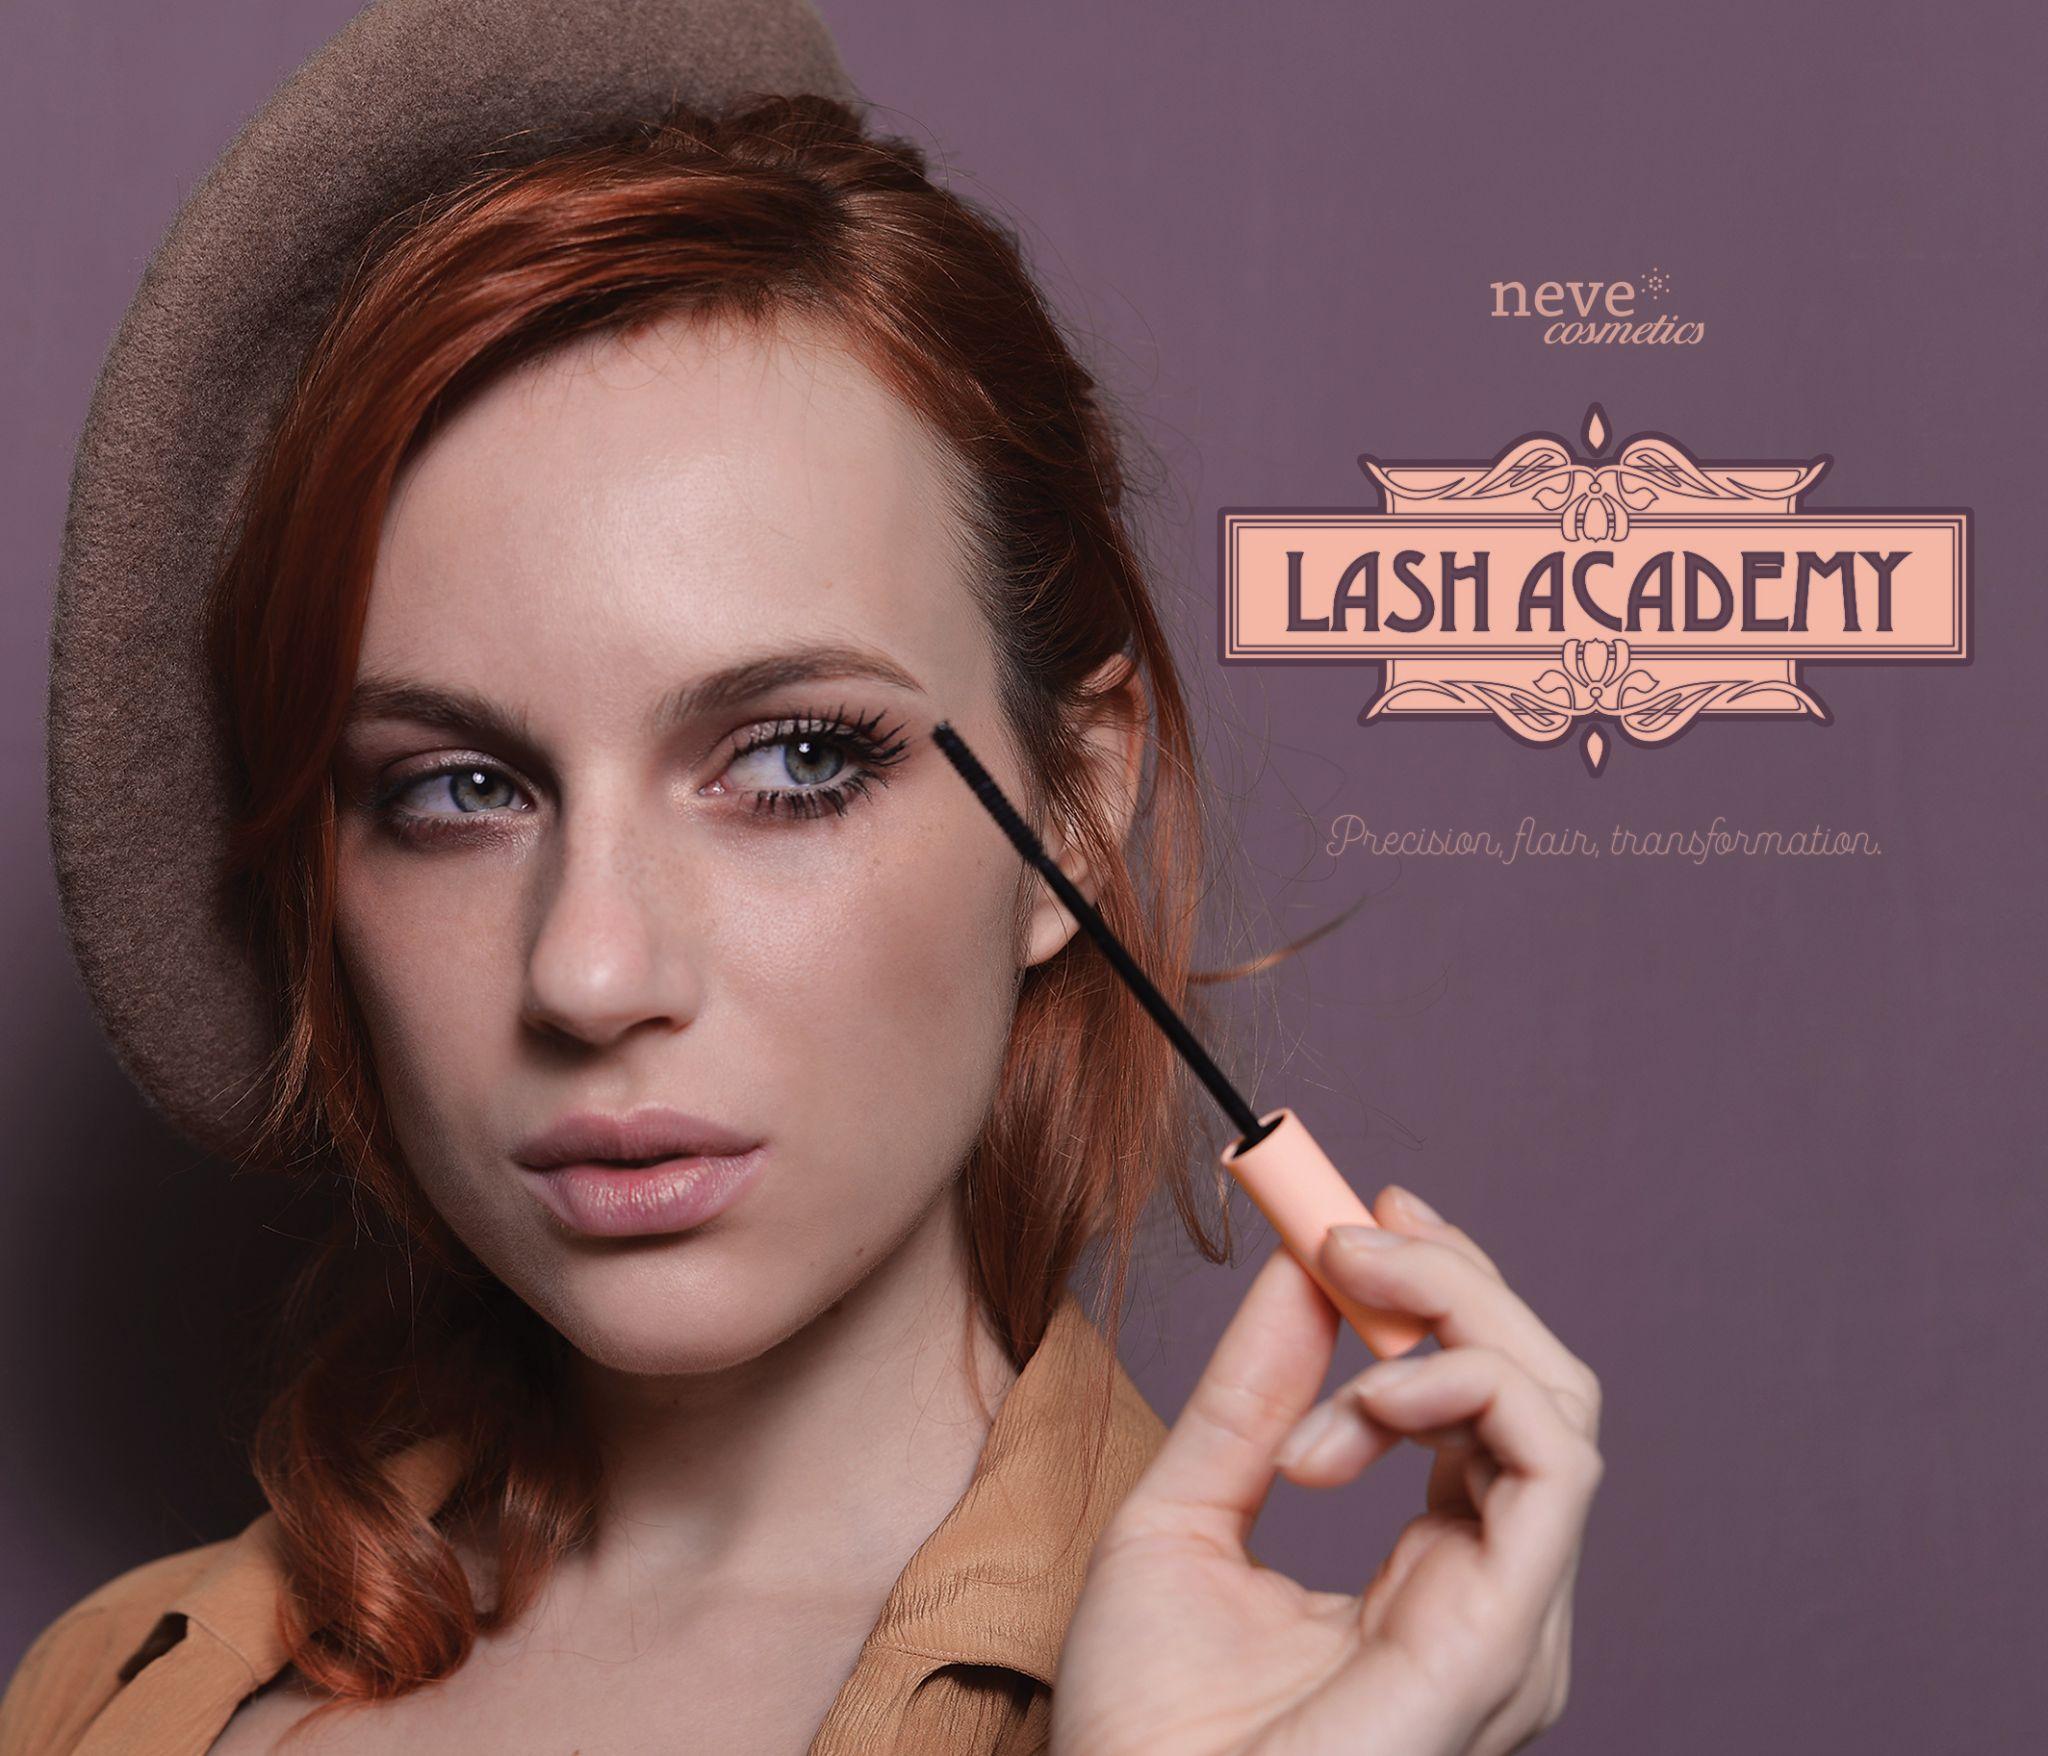 Lash Academy Neve Cosmetics